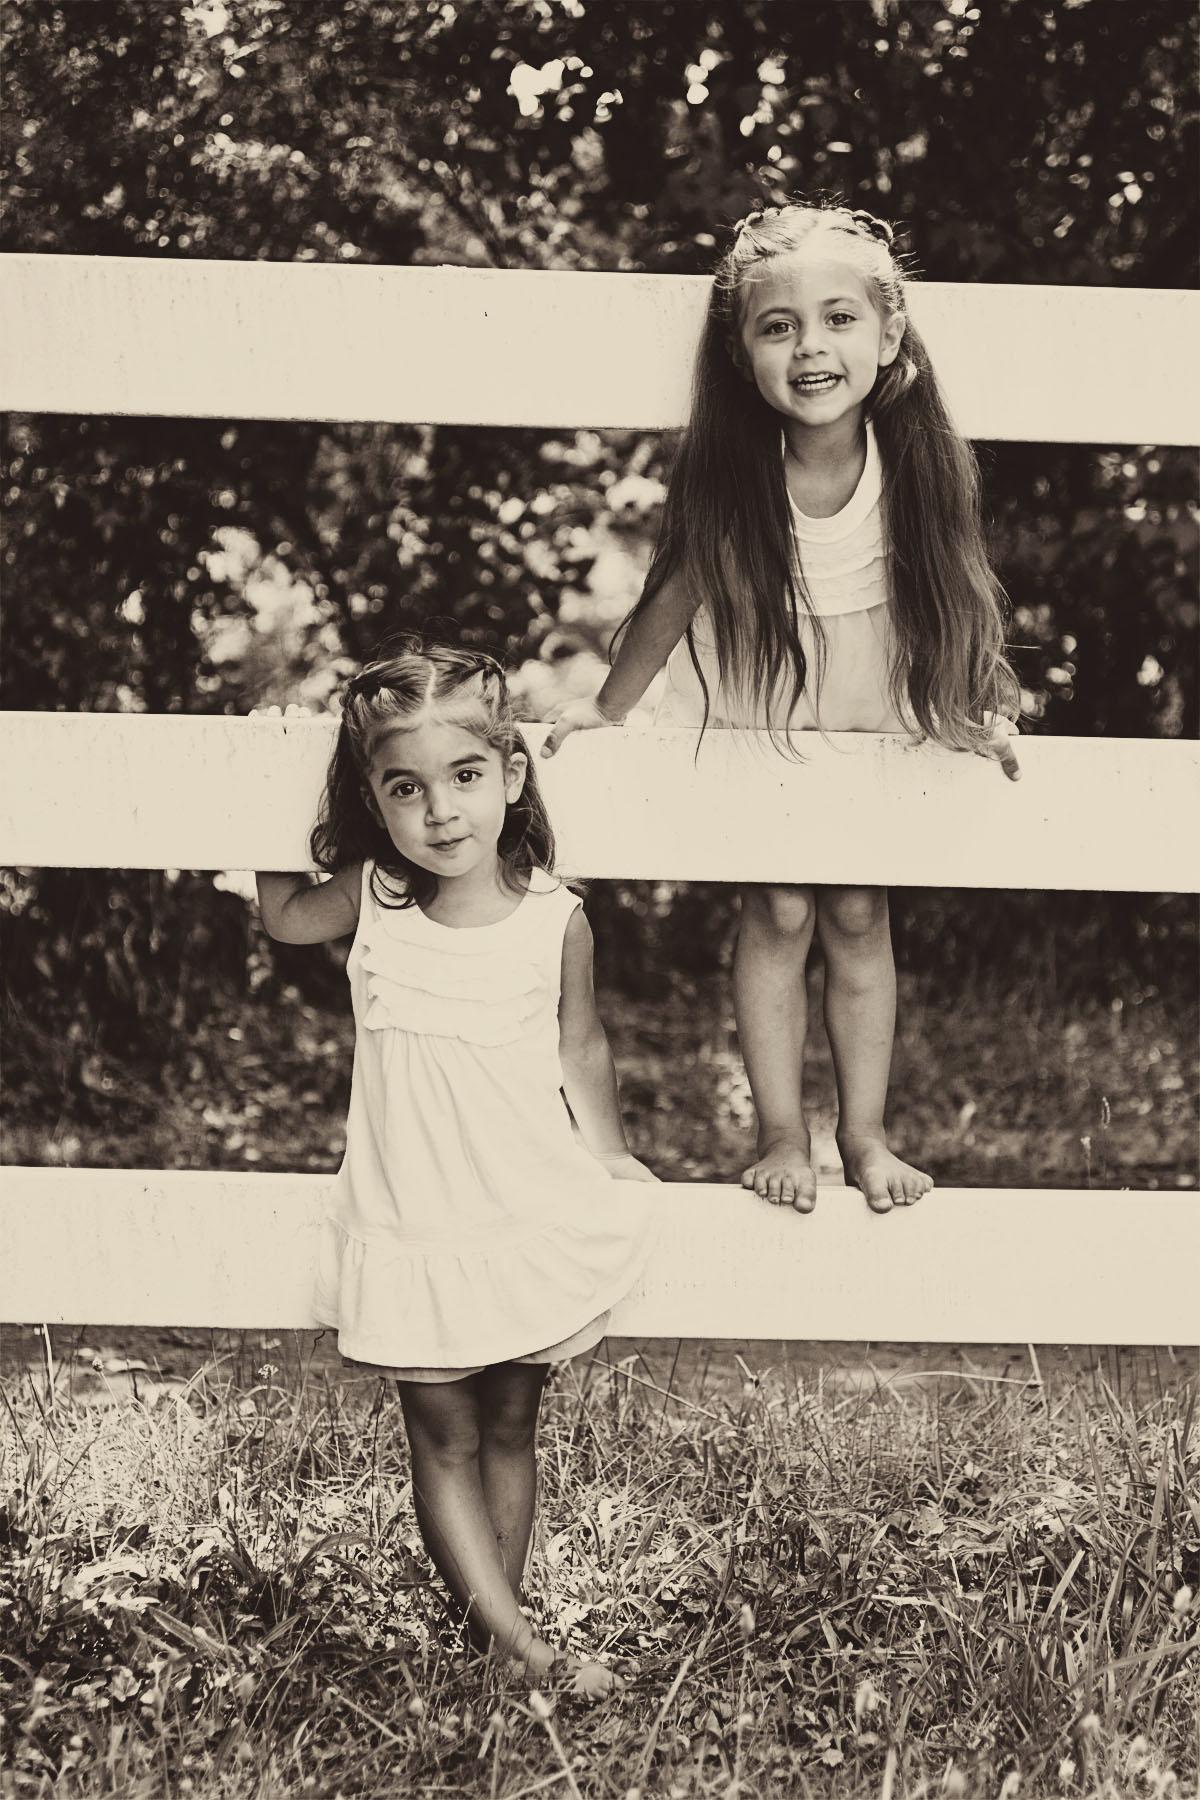 sistersfencesepia_1.jpg